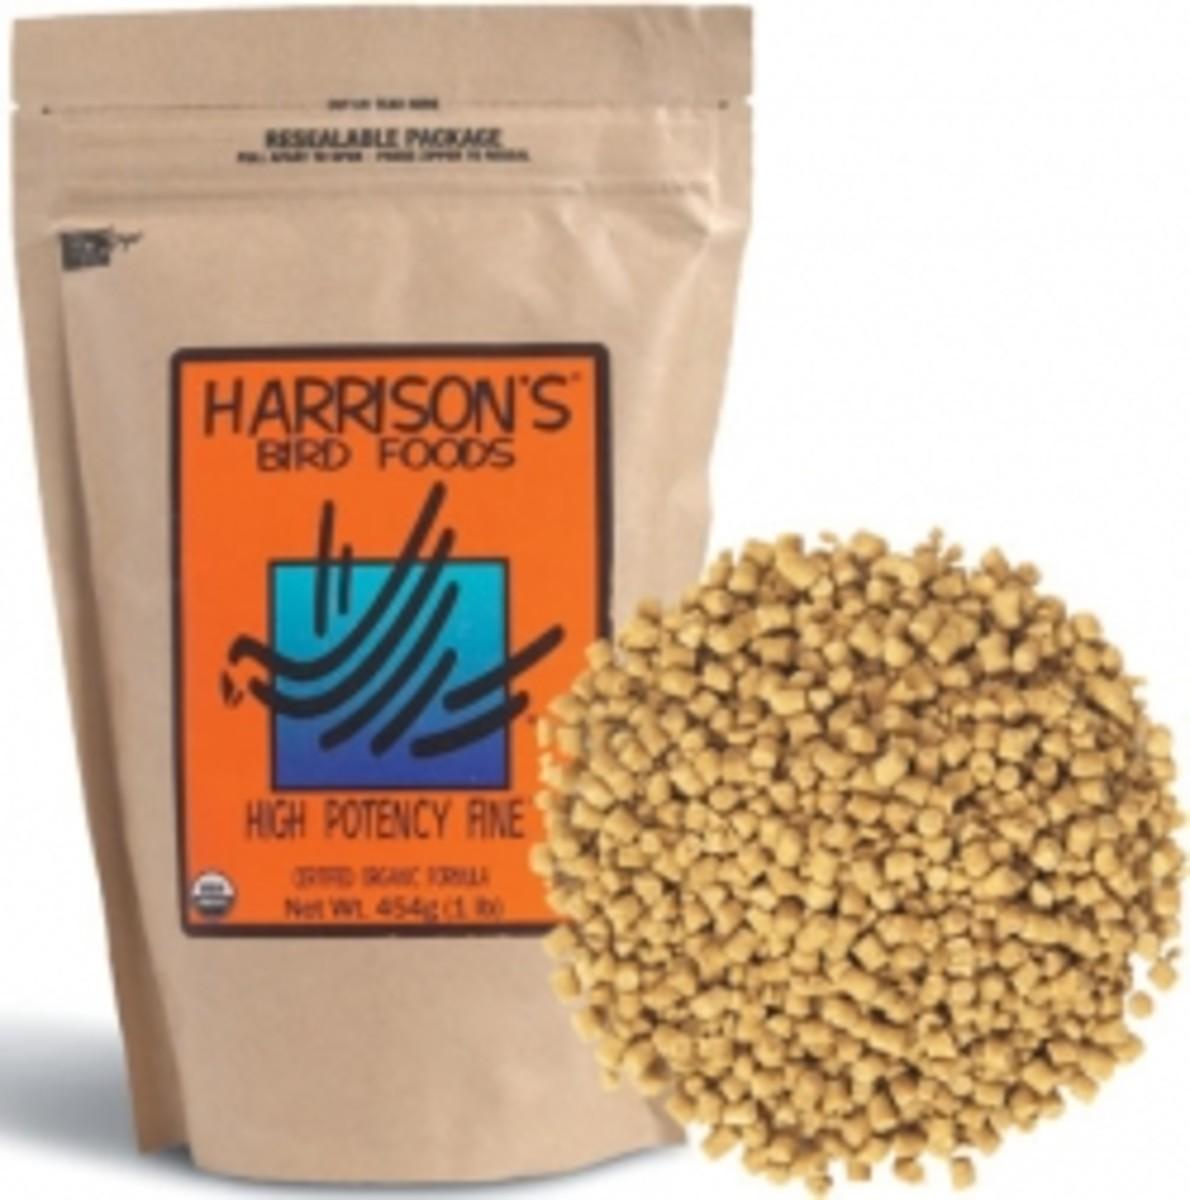 Harrison's Bird Foods is an organic pelleted food sold by m avian vet.